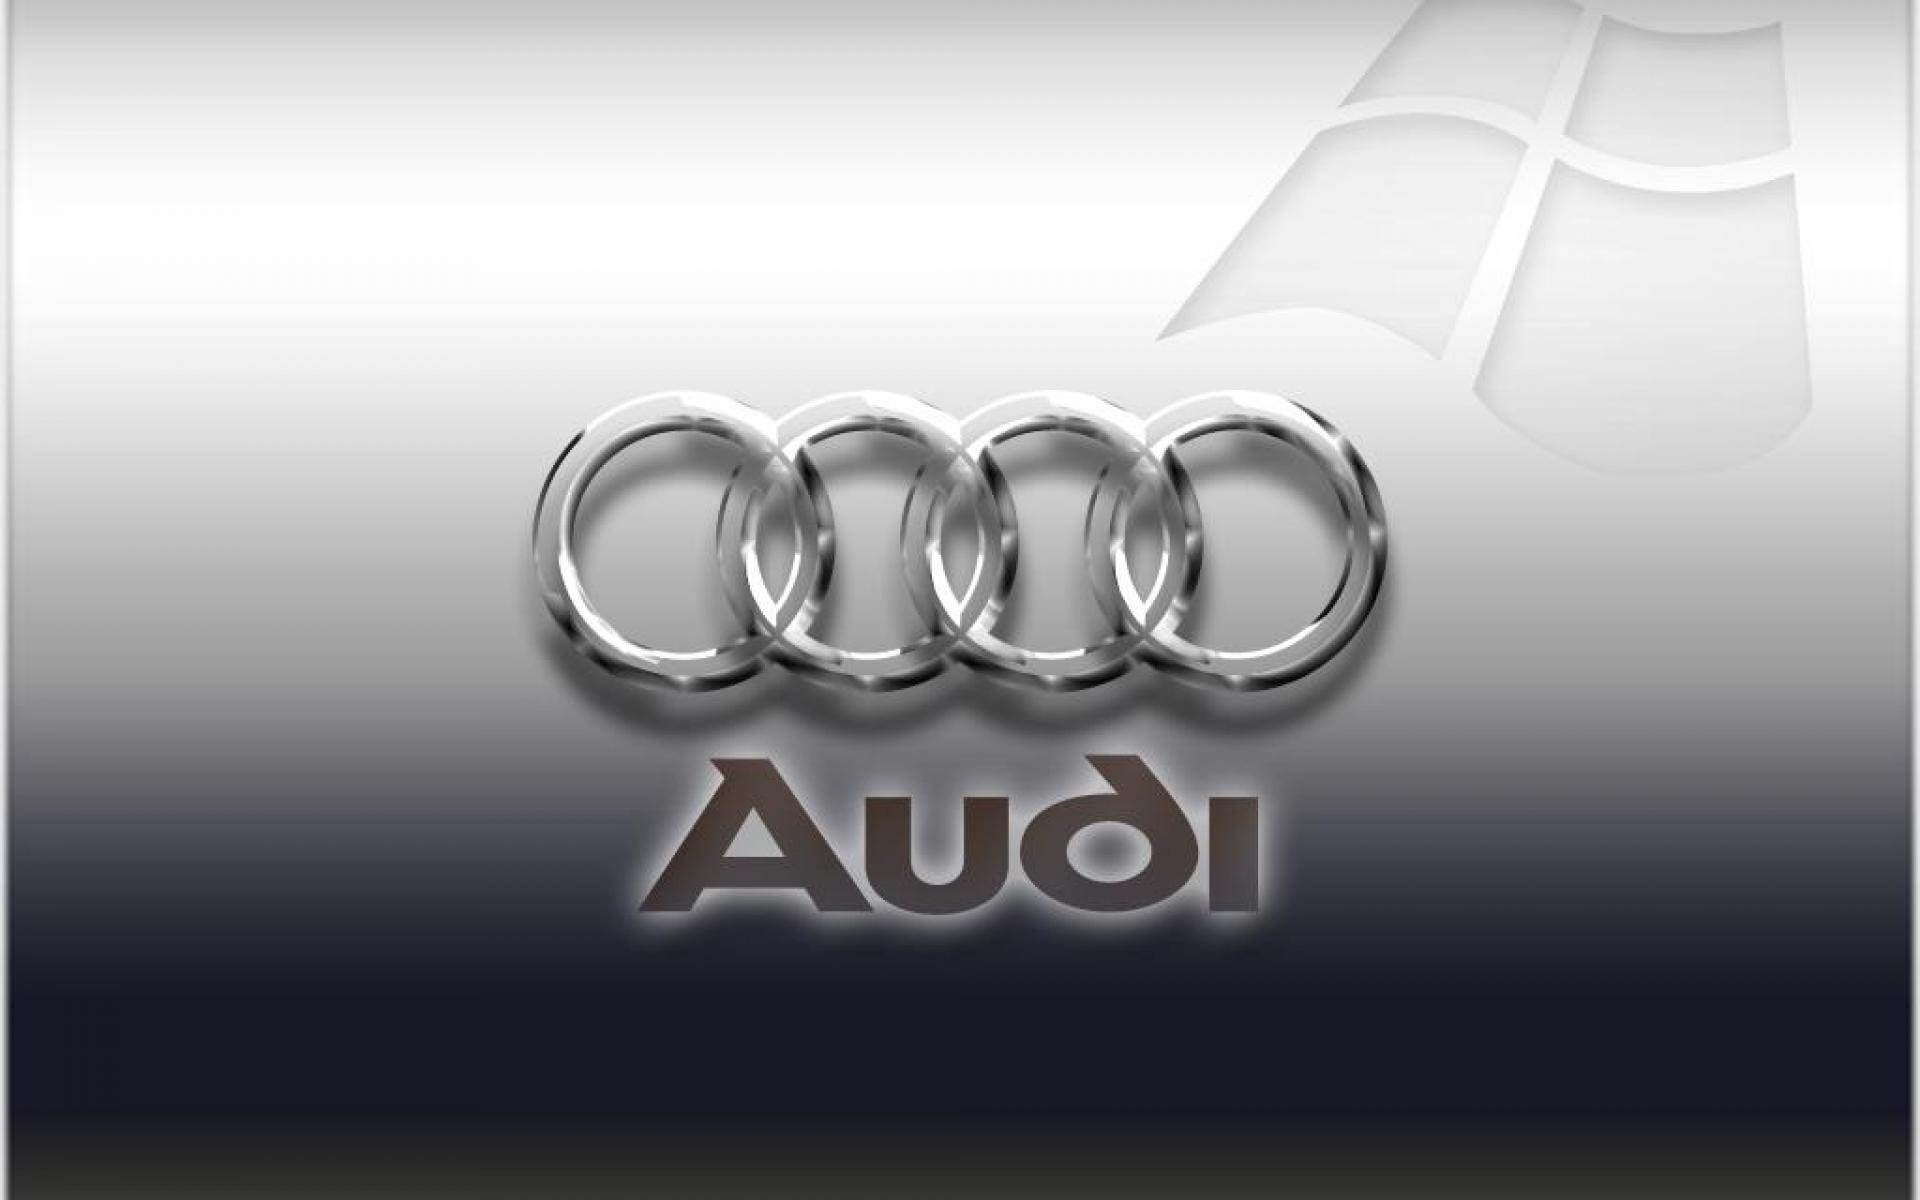 Amazing 3d Wallpapers For Mobile Audi Logo Wallpaper Hd Pixelstalk Net